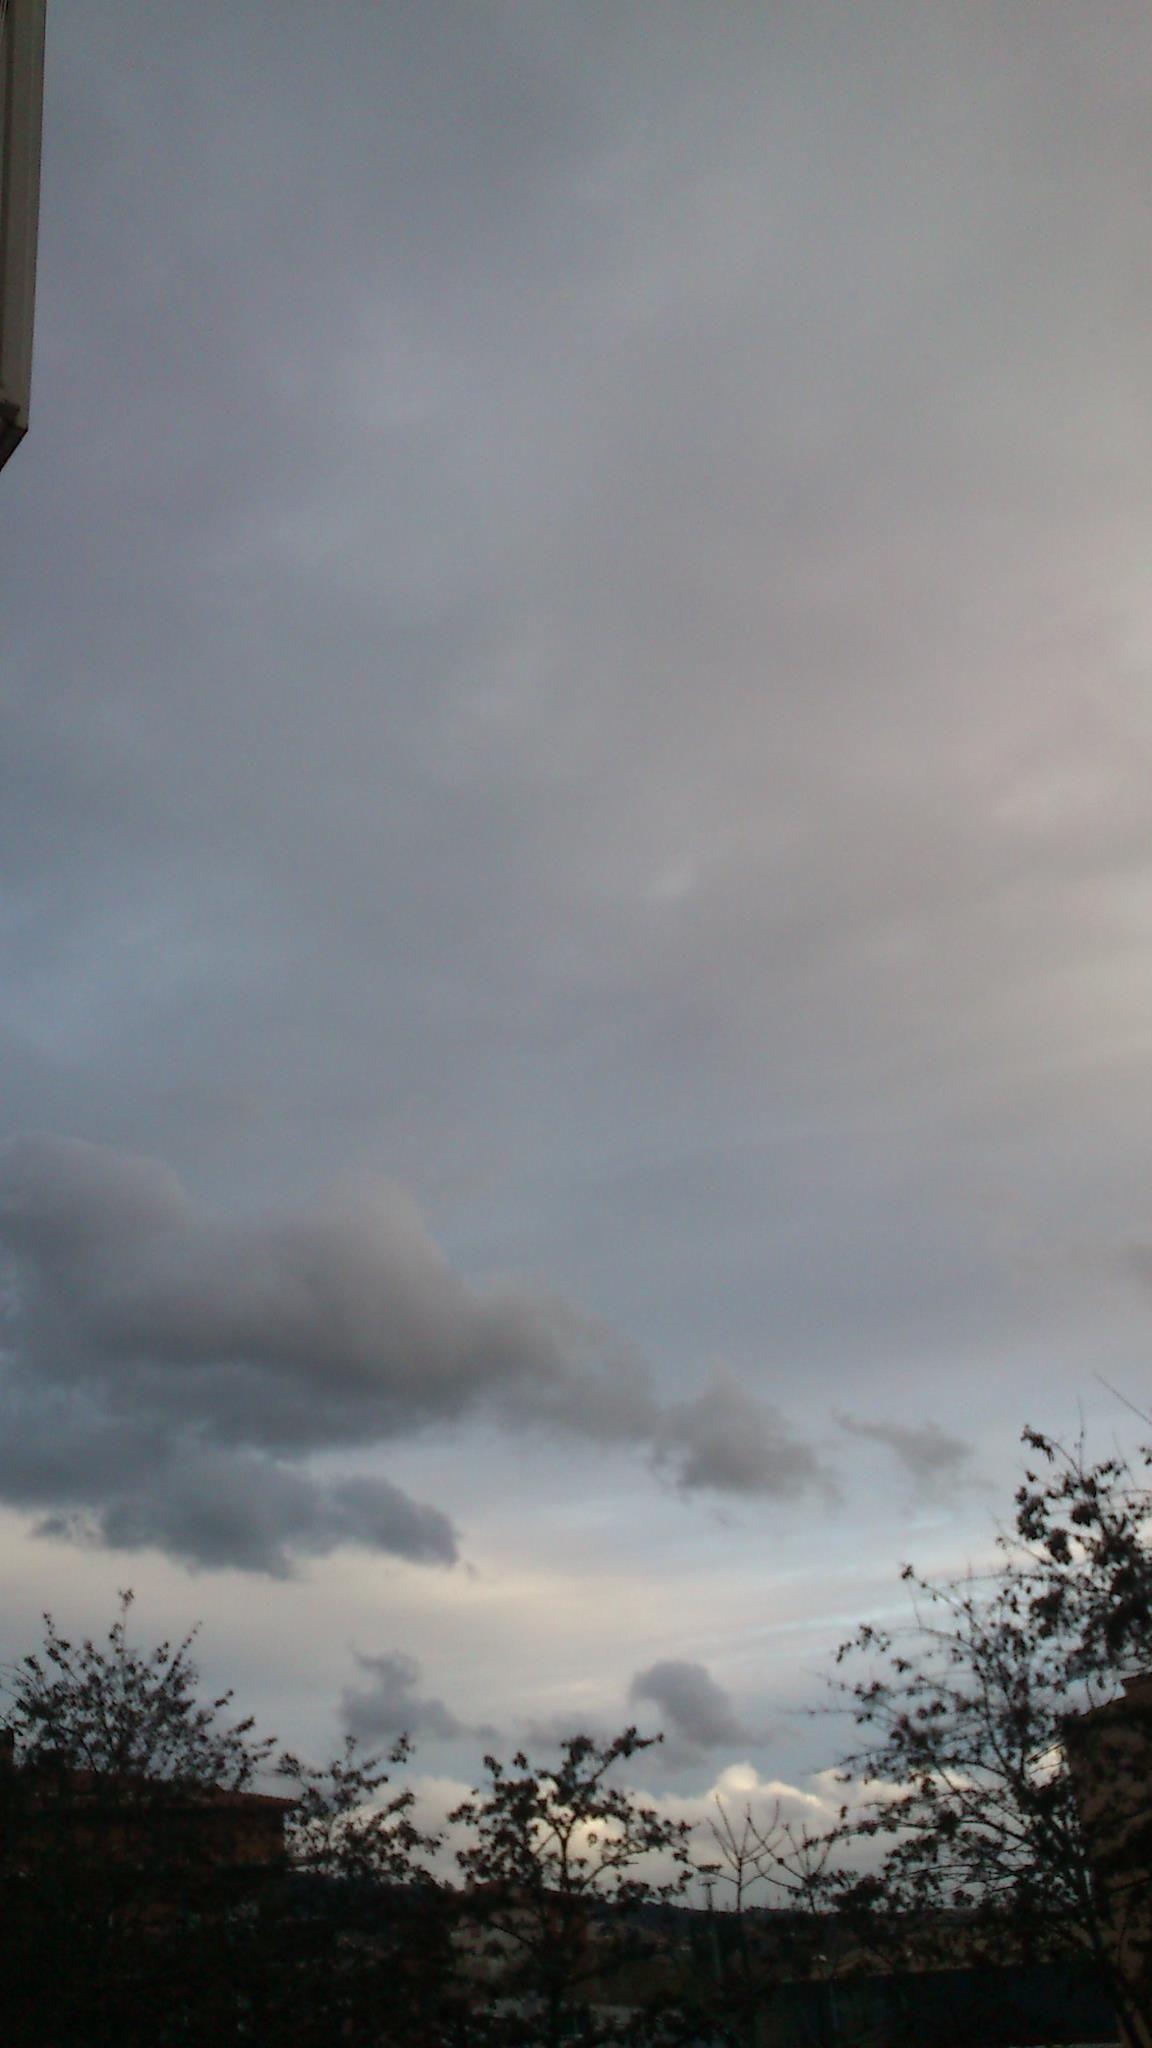 Cielo Nublado Landscape Nature Clouds